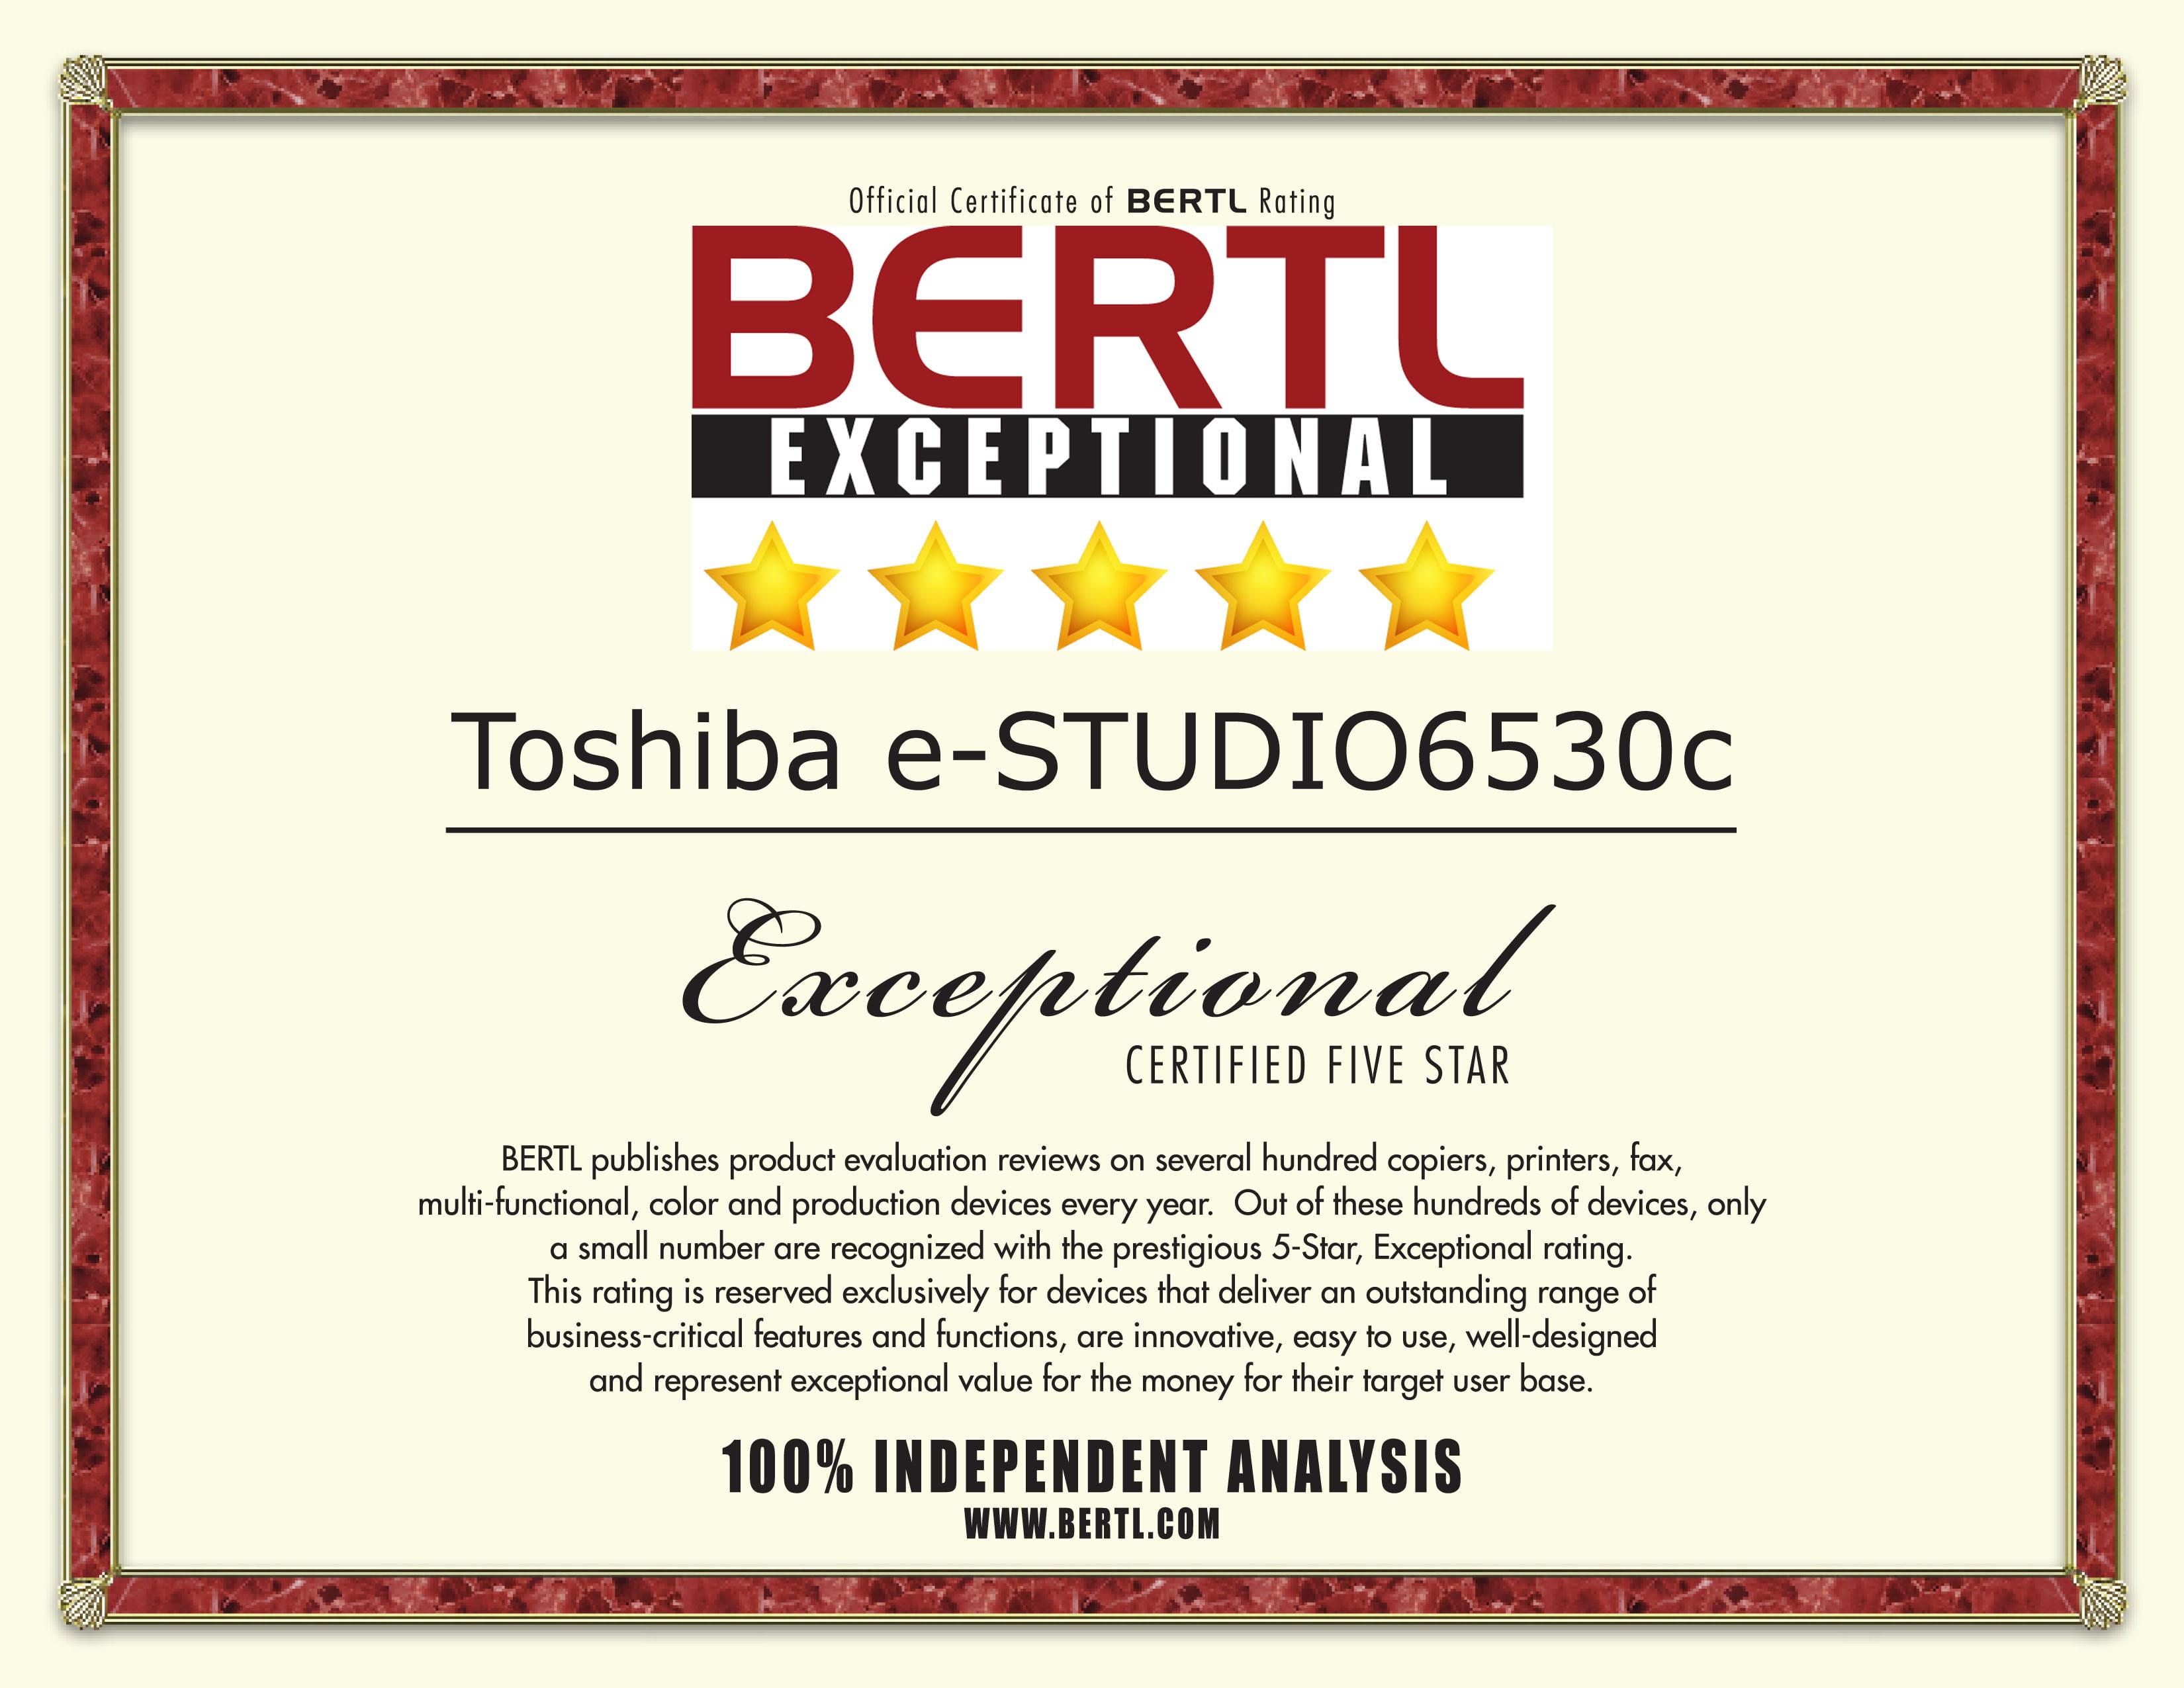 Awards toshiba 2009 bertl 5 star award e studio6530c xflitez Images